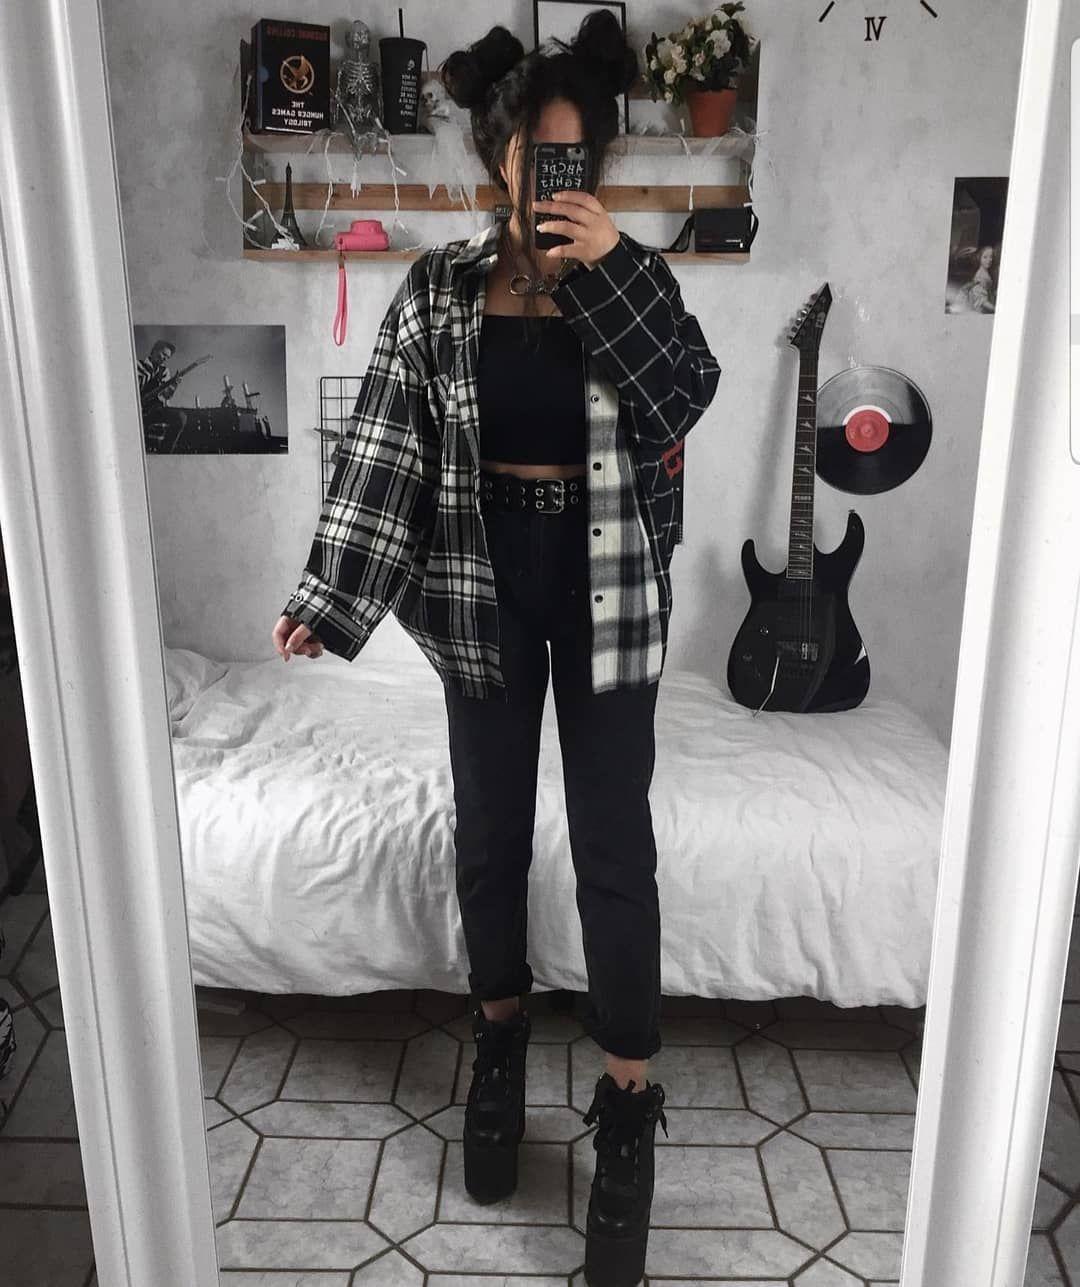 "Rock Style on Instagram: ""1, 2 or 3? Credit: @ramalamax ♡ ♡ ♡ ♡ ♡ ♡ ♡ ♡ ♡ #rock #rockstyle #90sstyle #grungestyle #alternative #vintagefashion #fashion #grunge…"""